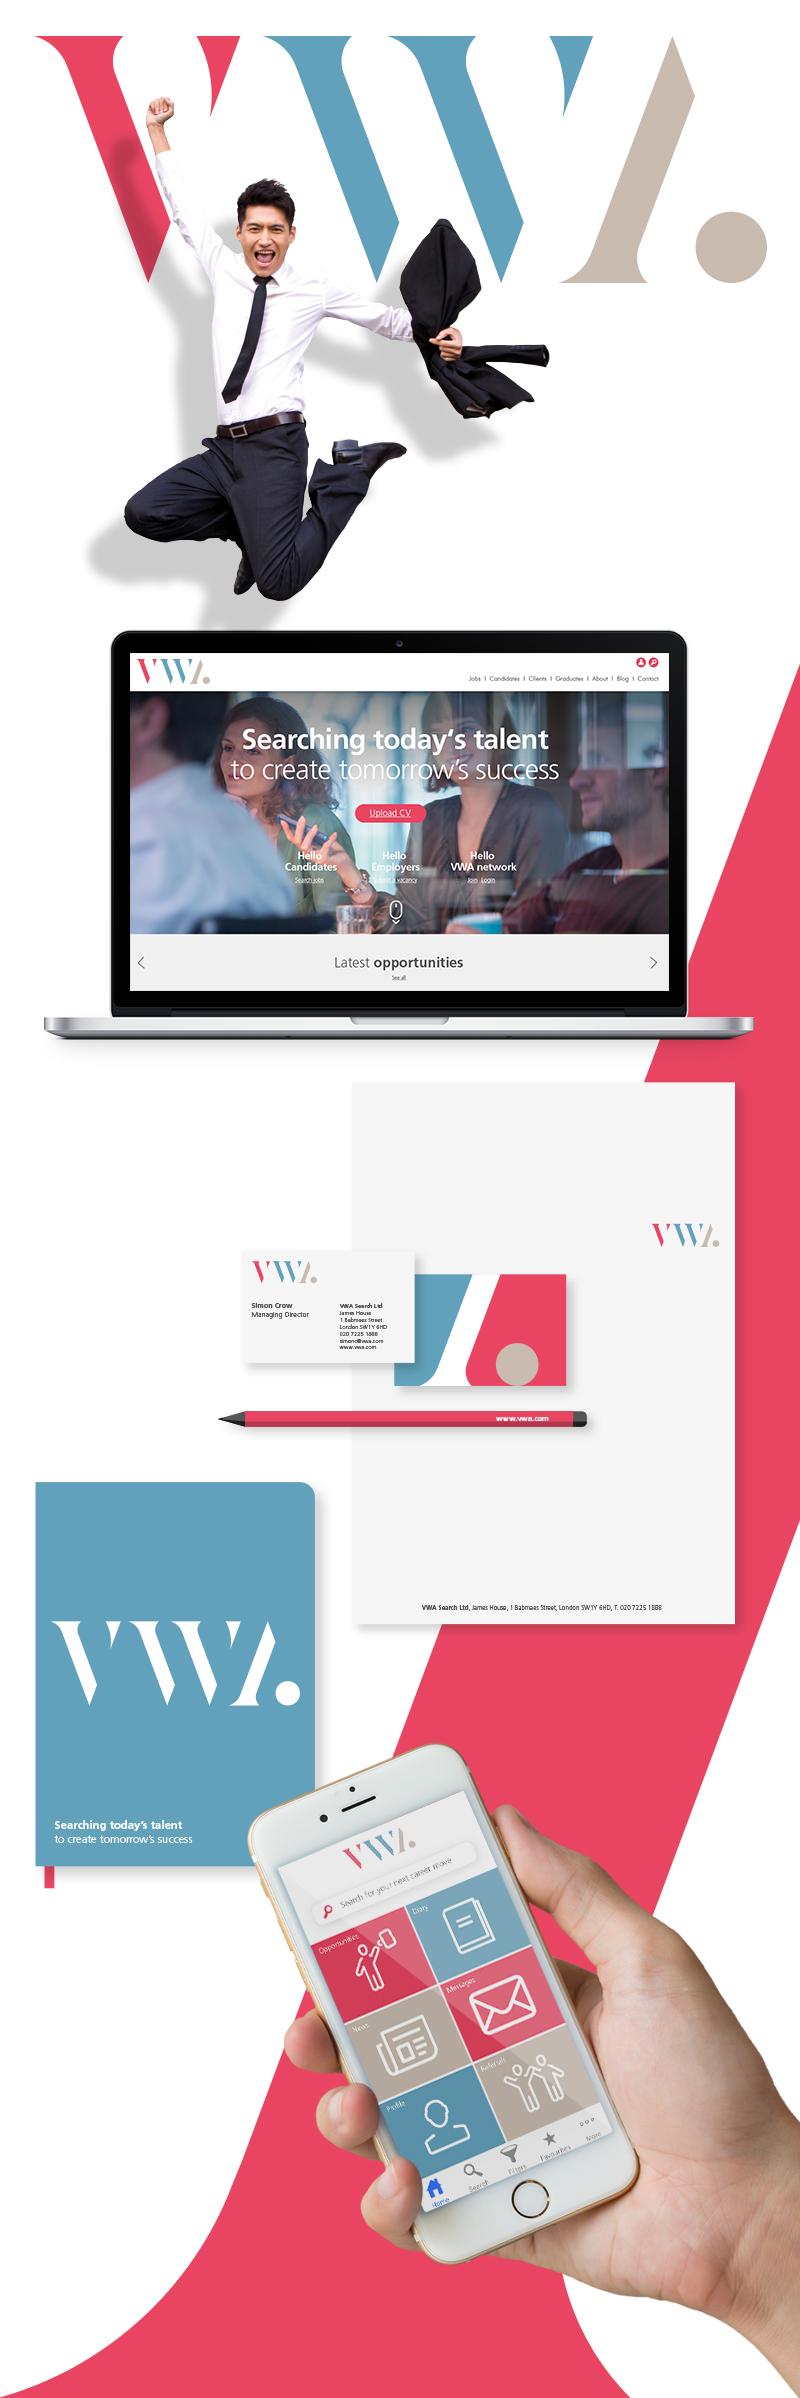 VWA-DM-website-presentation2.jpg